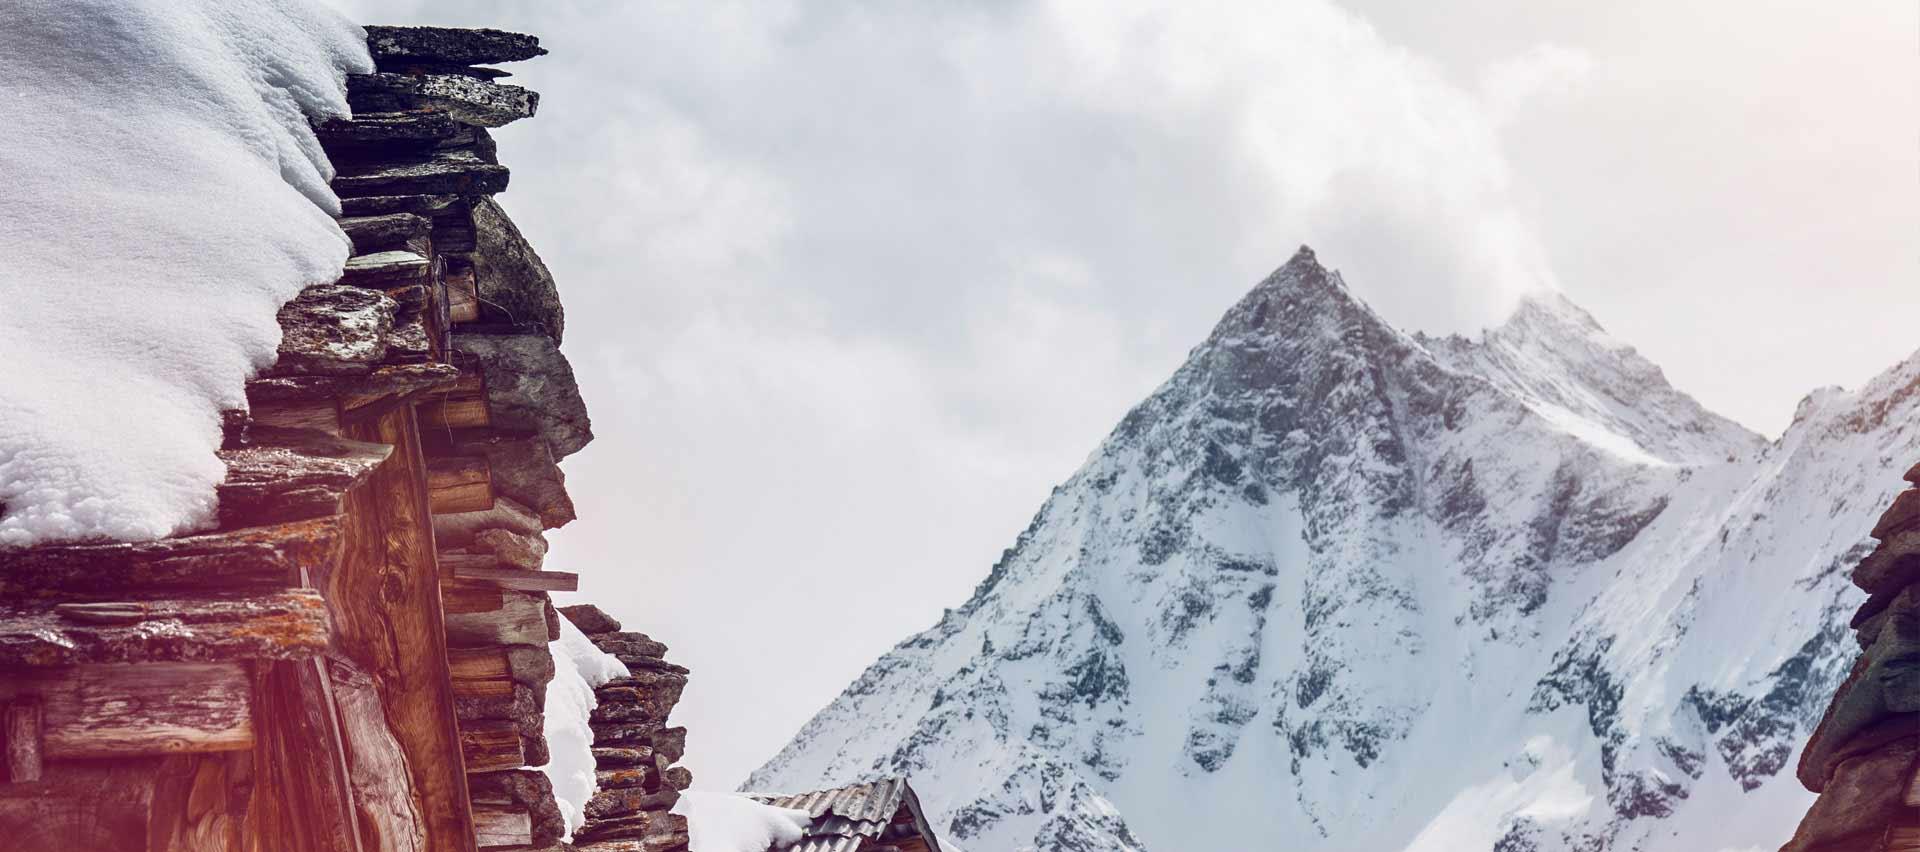 backcountry-Alpine-ski-winter-safari